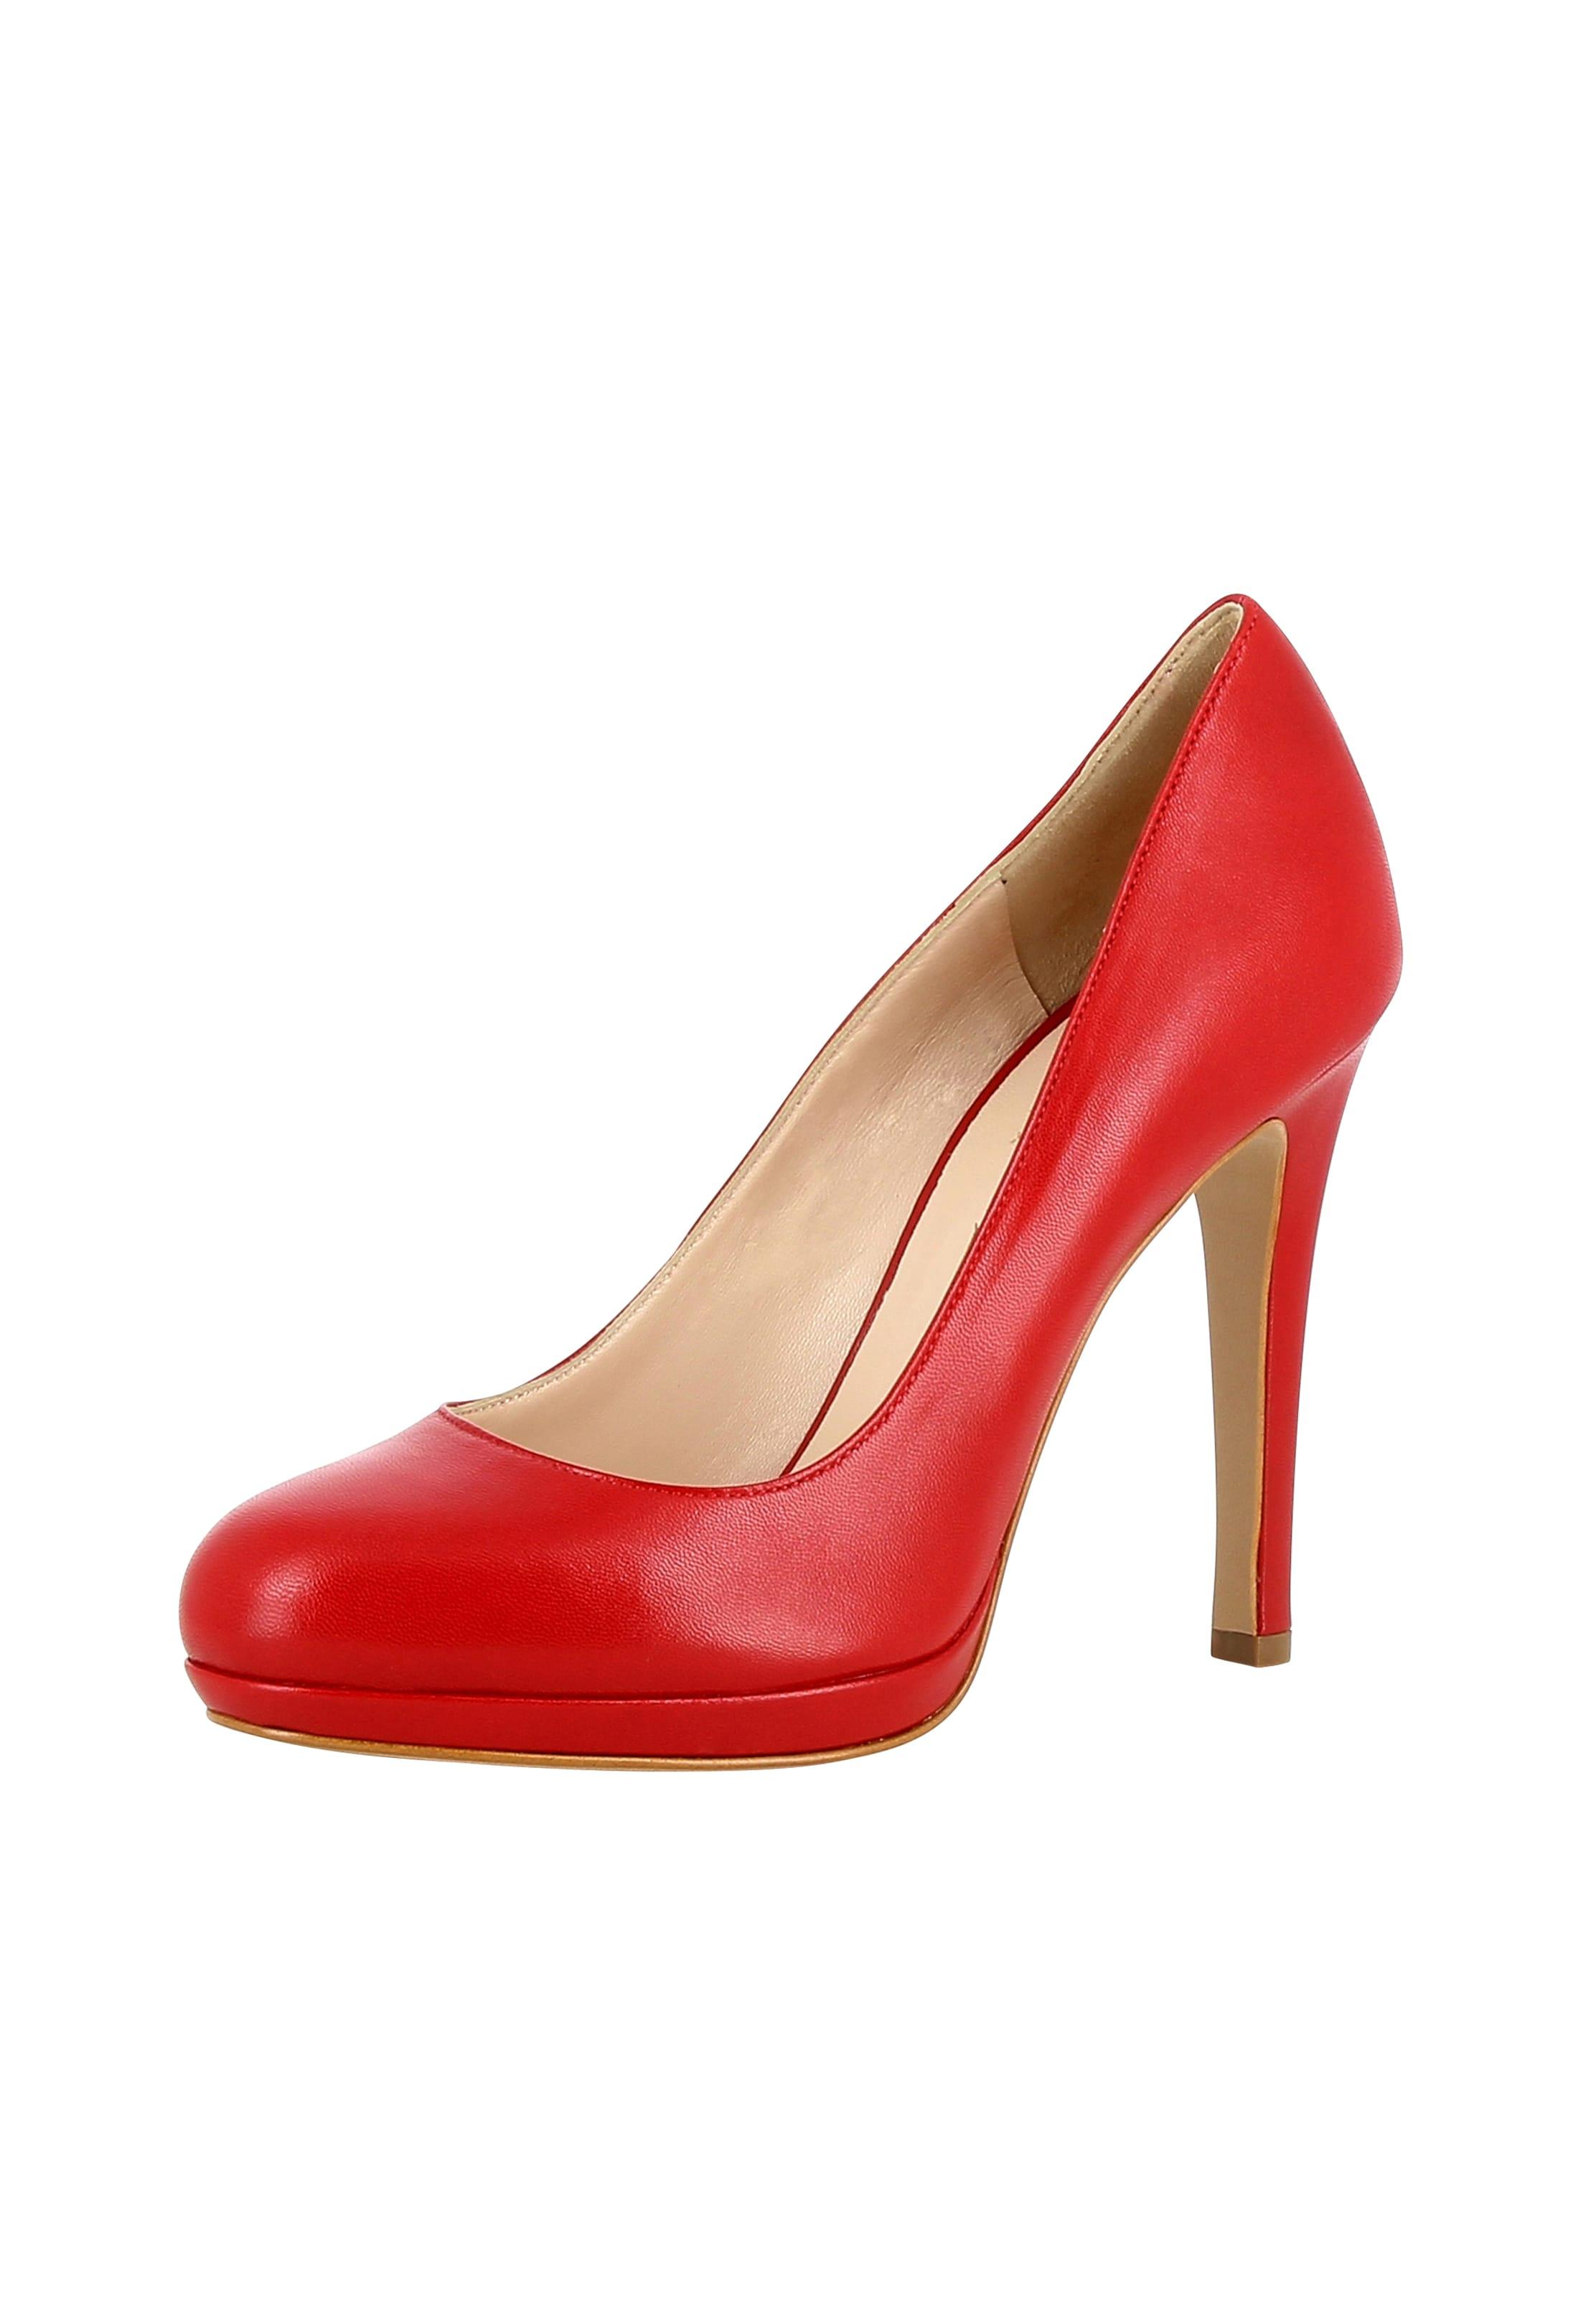 Escarpins Rouge 'cristina' En En Evita Evita Rouge Escarpins 'cristina' WEDIY29H